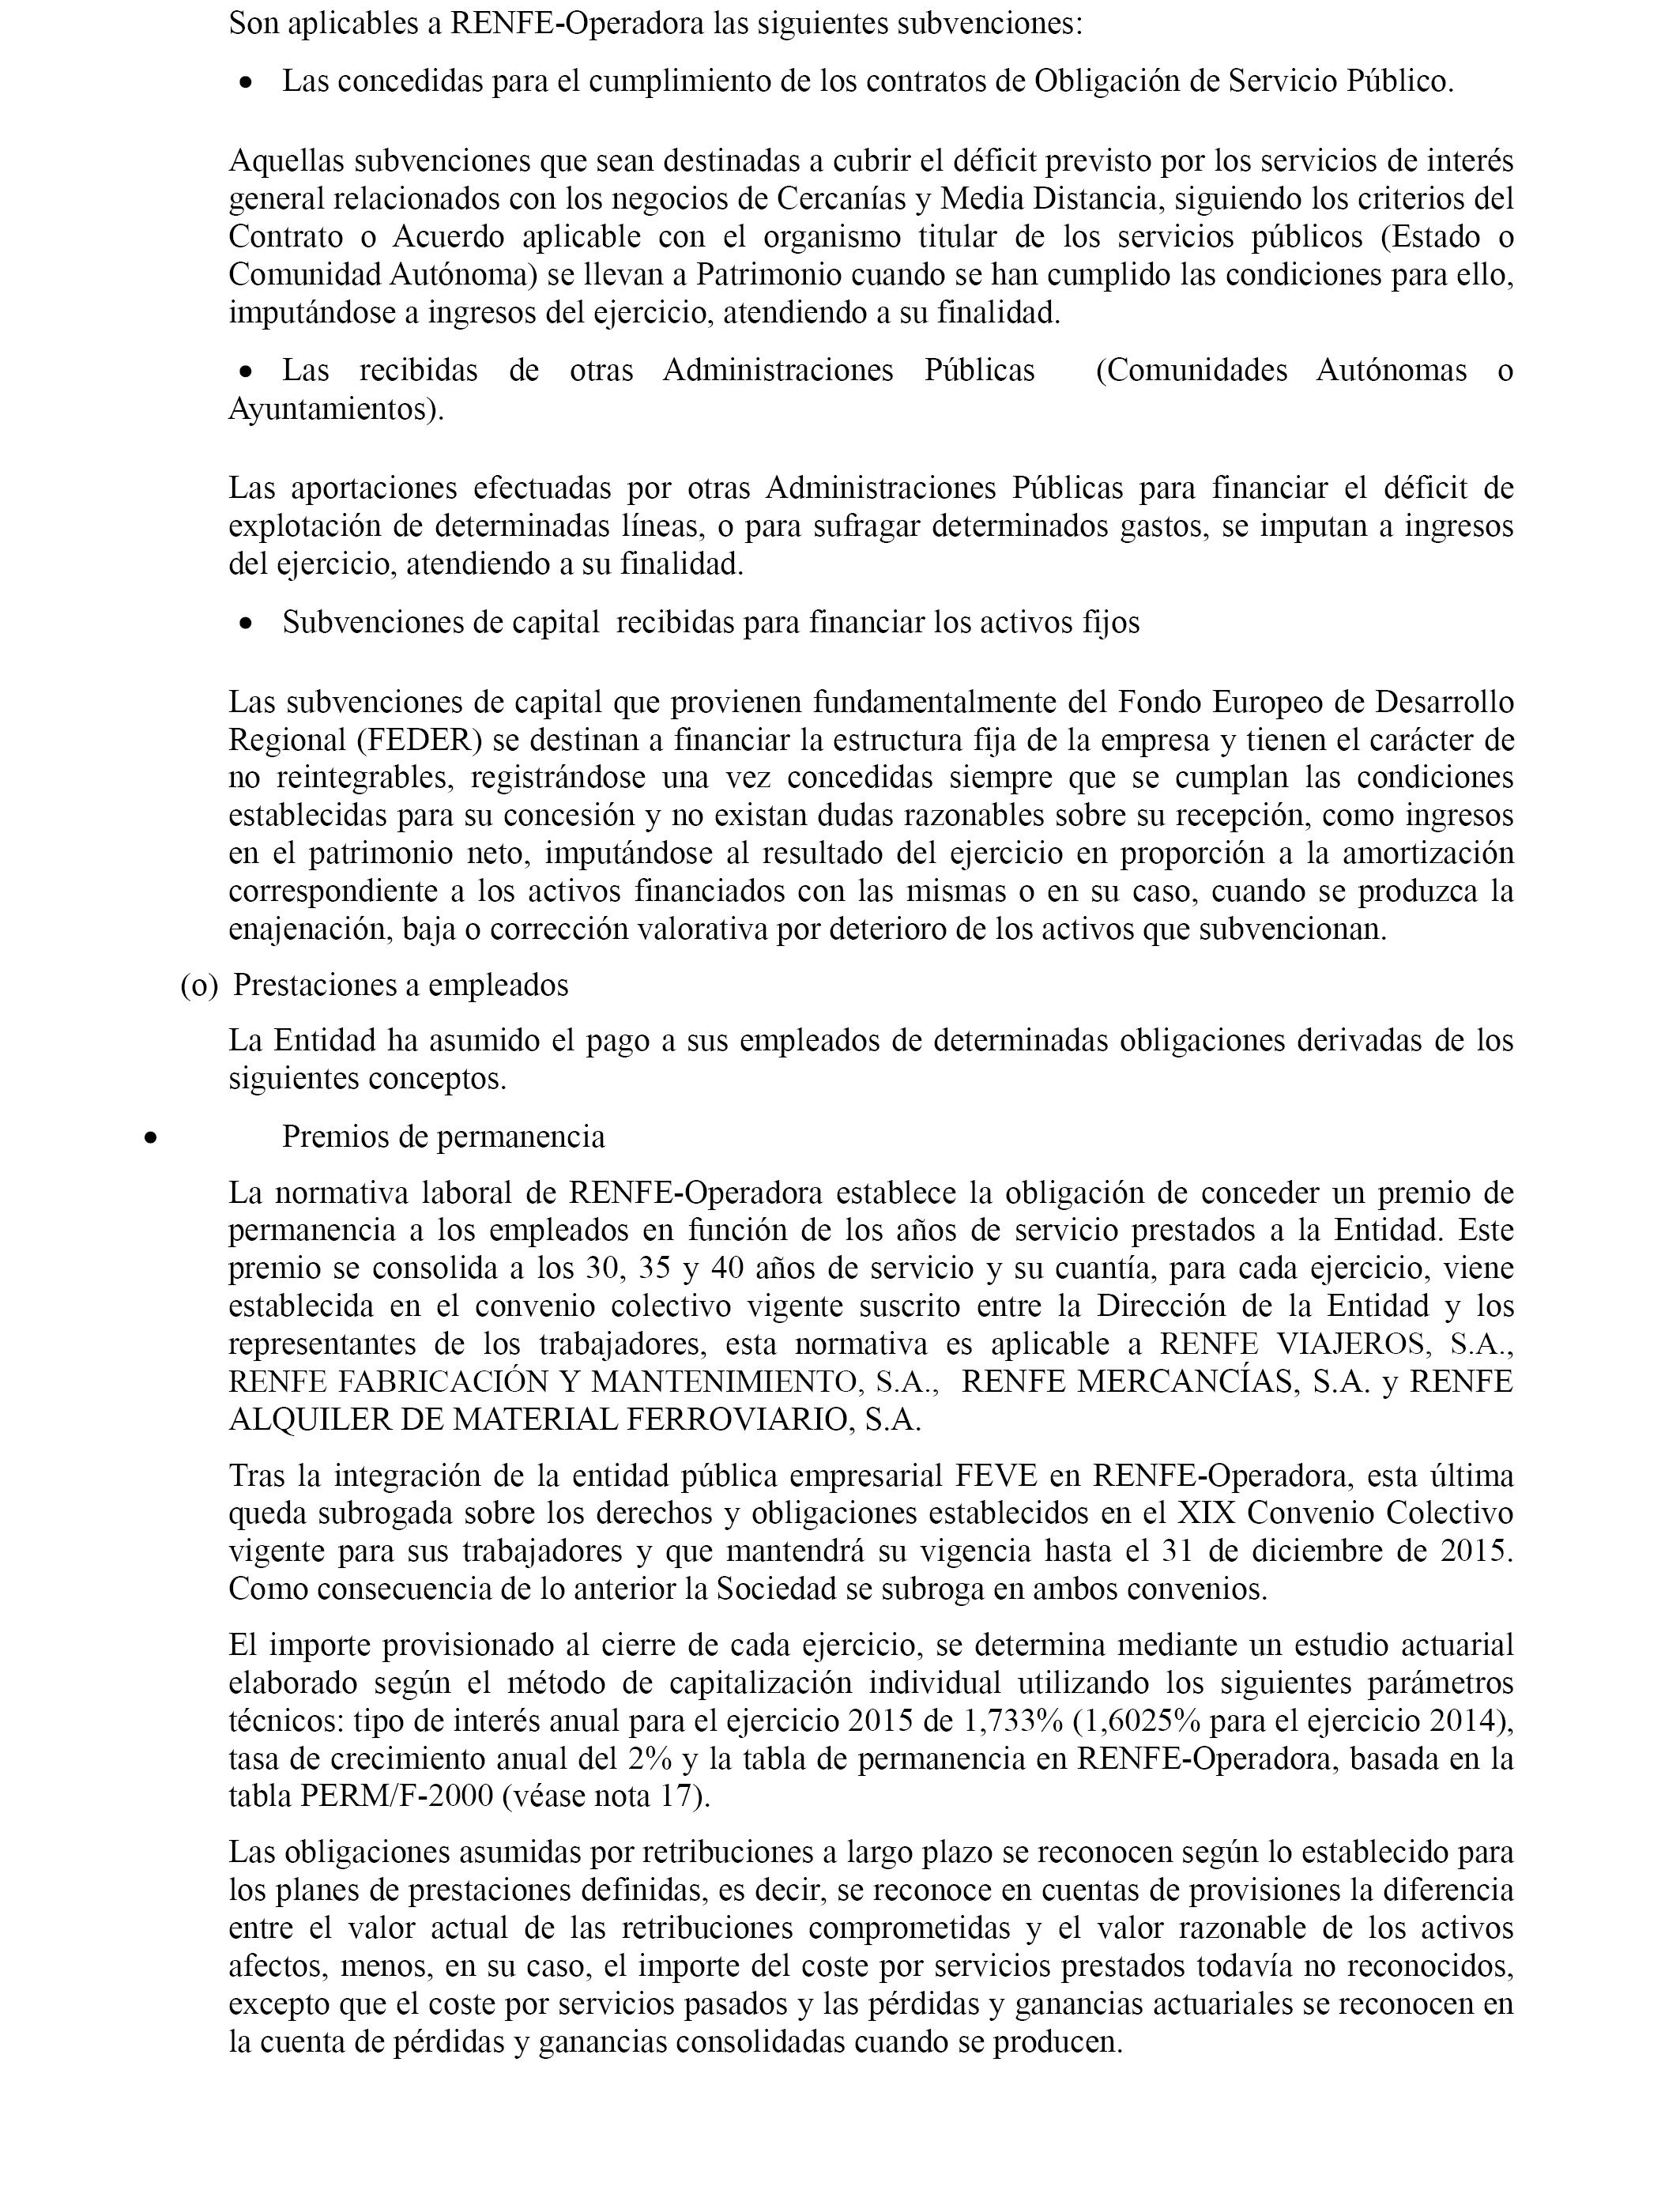 BOE.es - Documento BOE-A-2016-8182